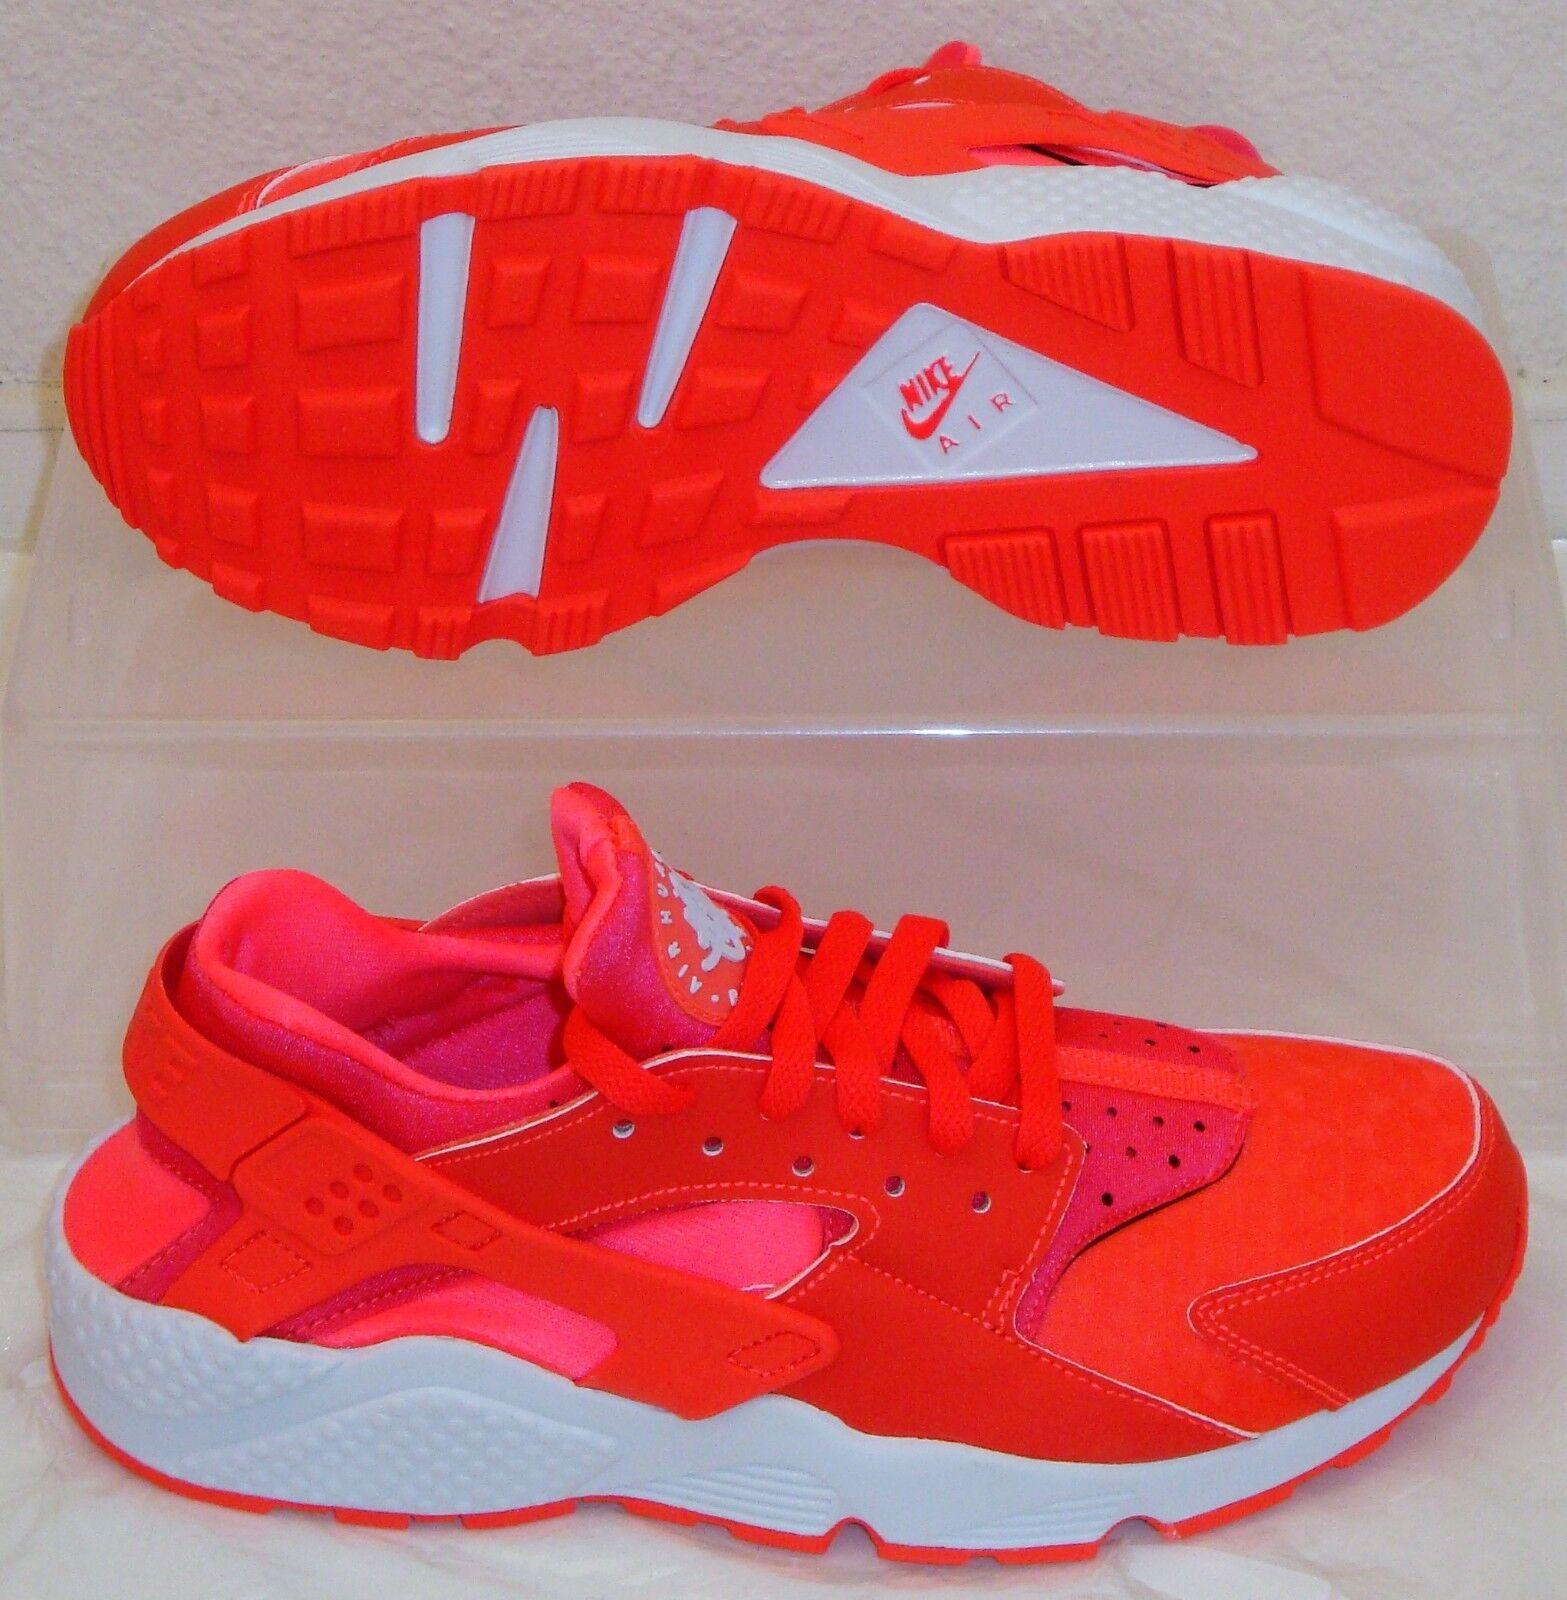 b267a66fc841 ... Nike Nike Nike Air Huarache Run Crimson Womens US Size 8.5 61cfea ...